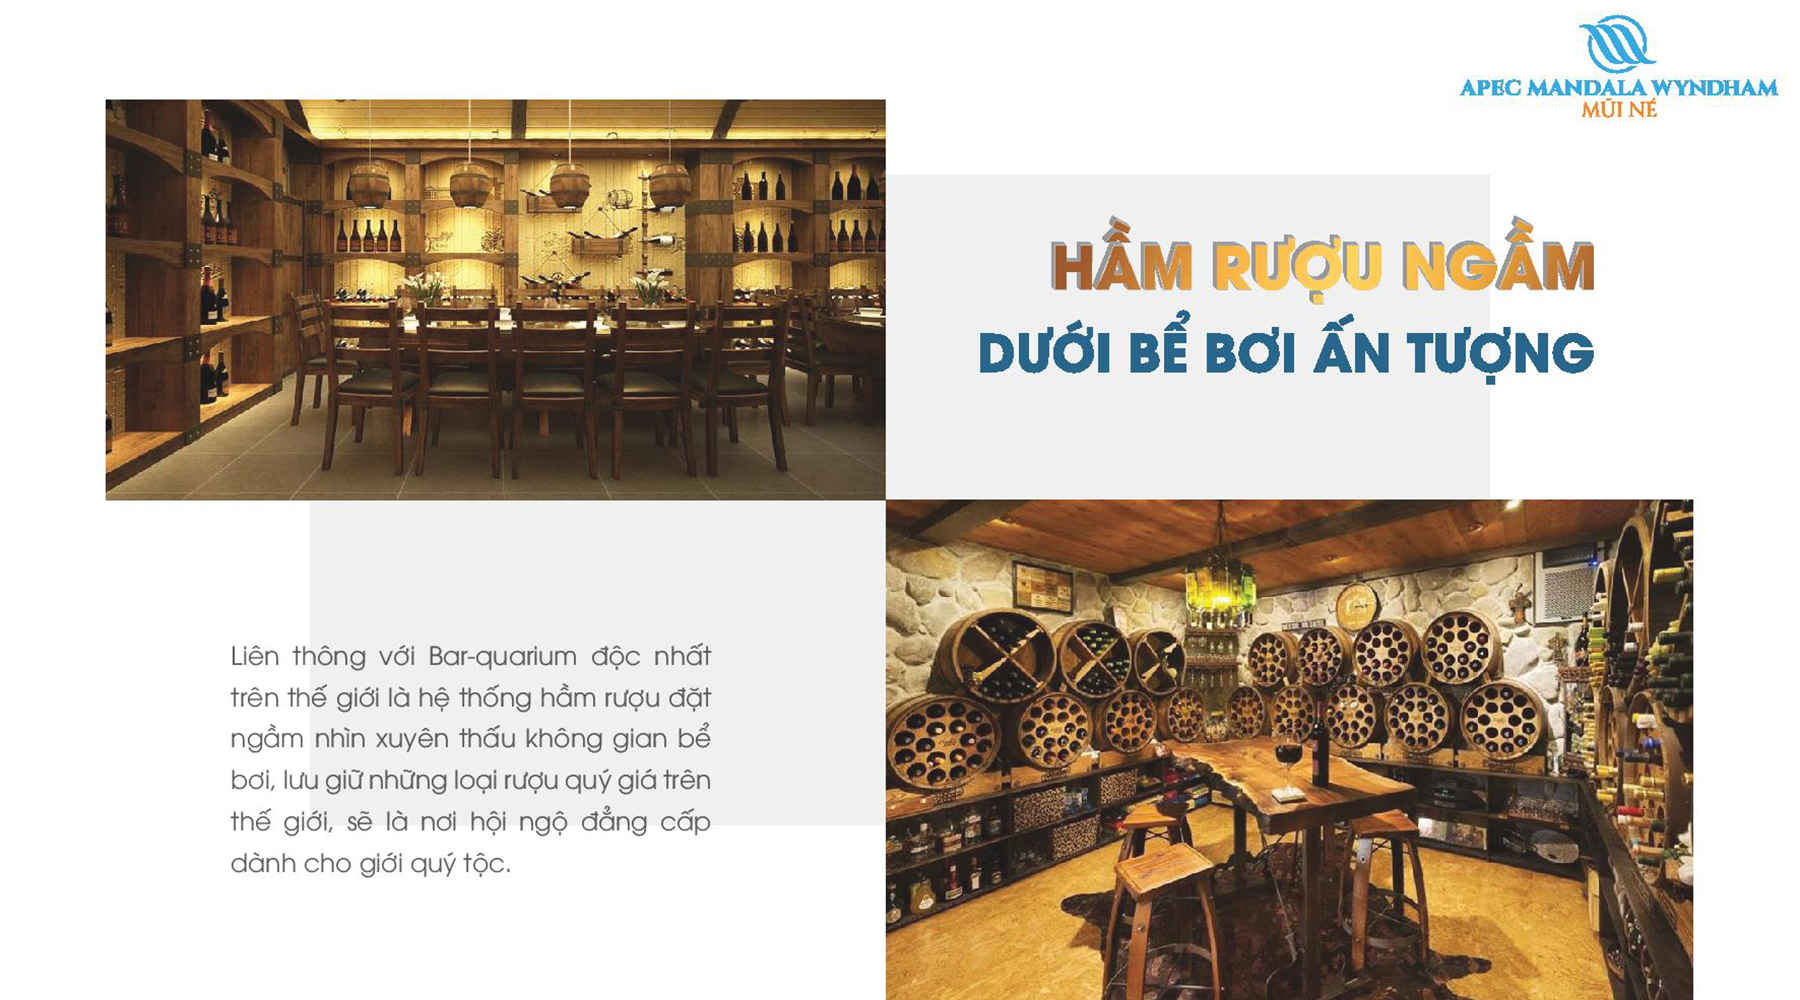 Tiện ích dự án Apec Mandala Wyndham Mũi Né Hầm Rượu